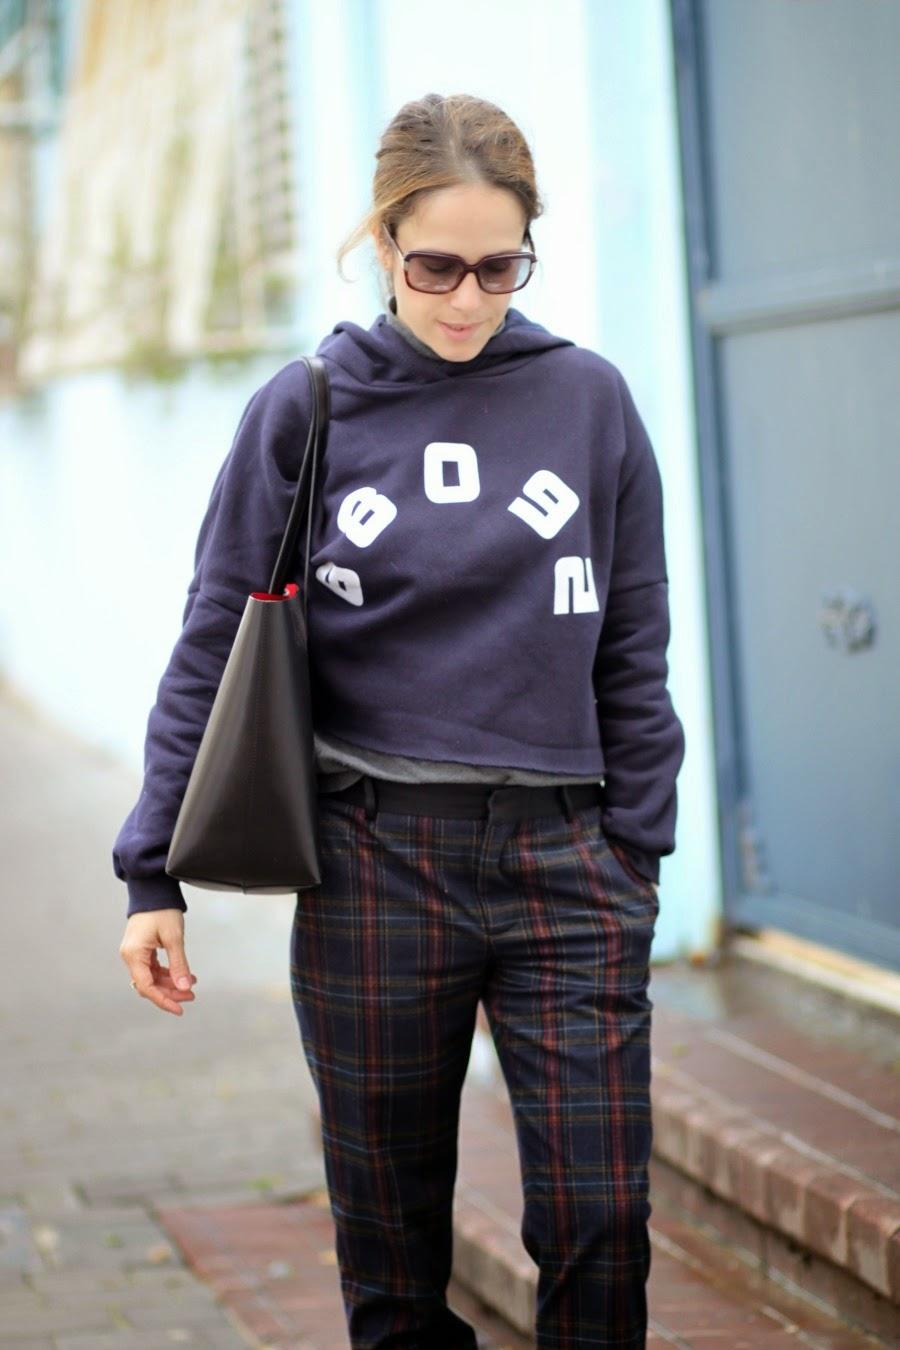 lookoftheday, fashioblog, fw, Isabelmarantbratsneakers, plaidprint, spring2015, streetstyle, אופנהבלוגאופנה,